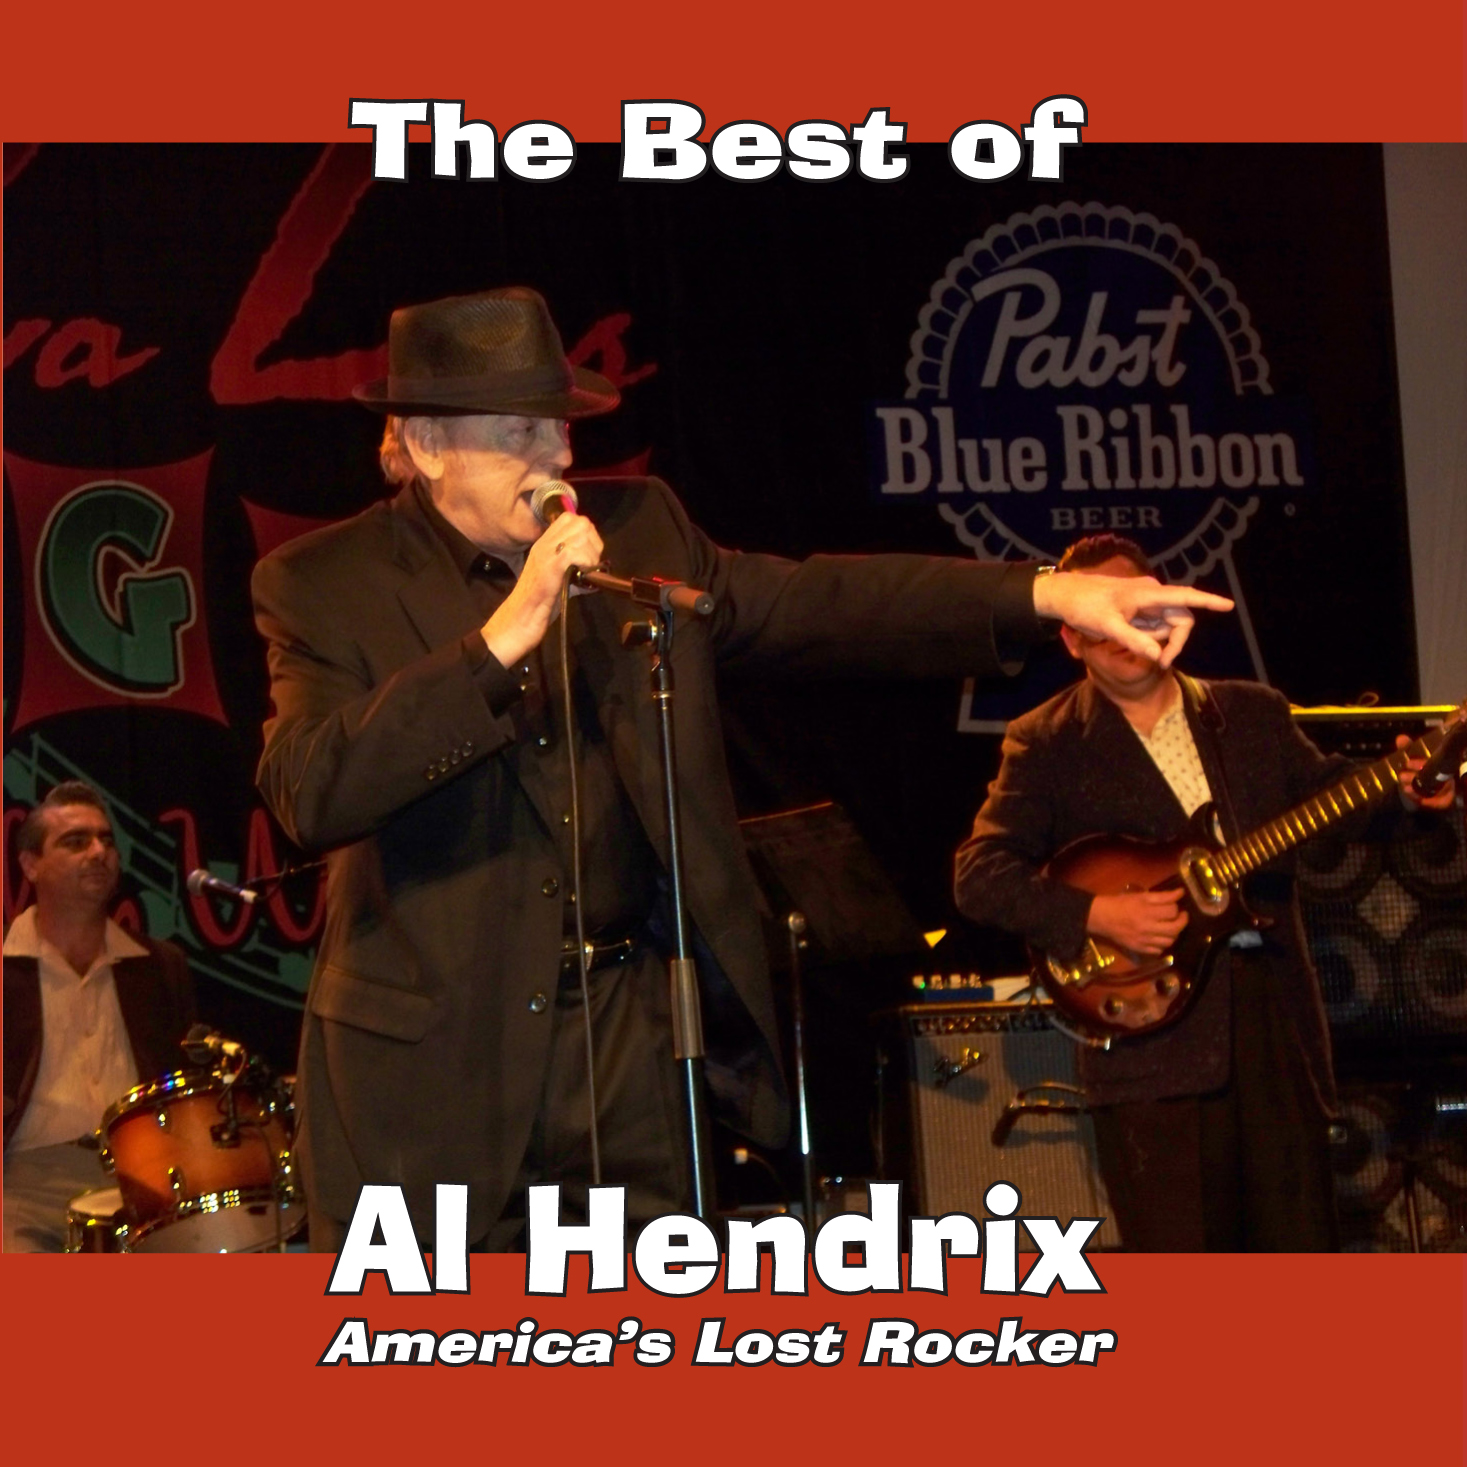 The Best of Al Hendrix cover RGB 1467